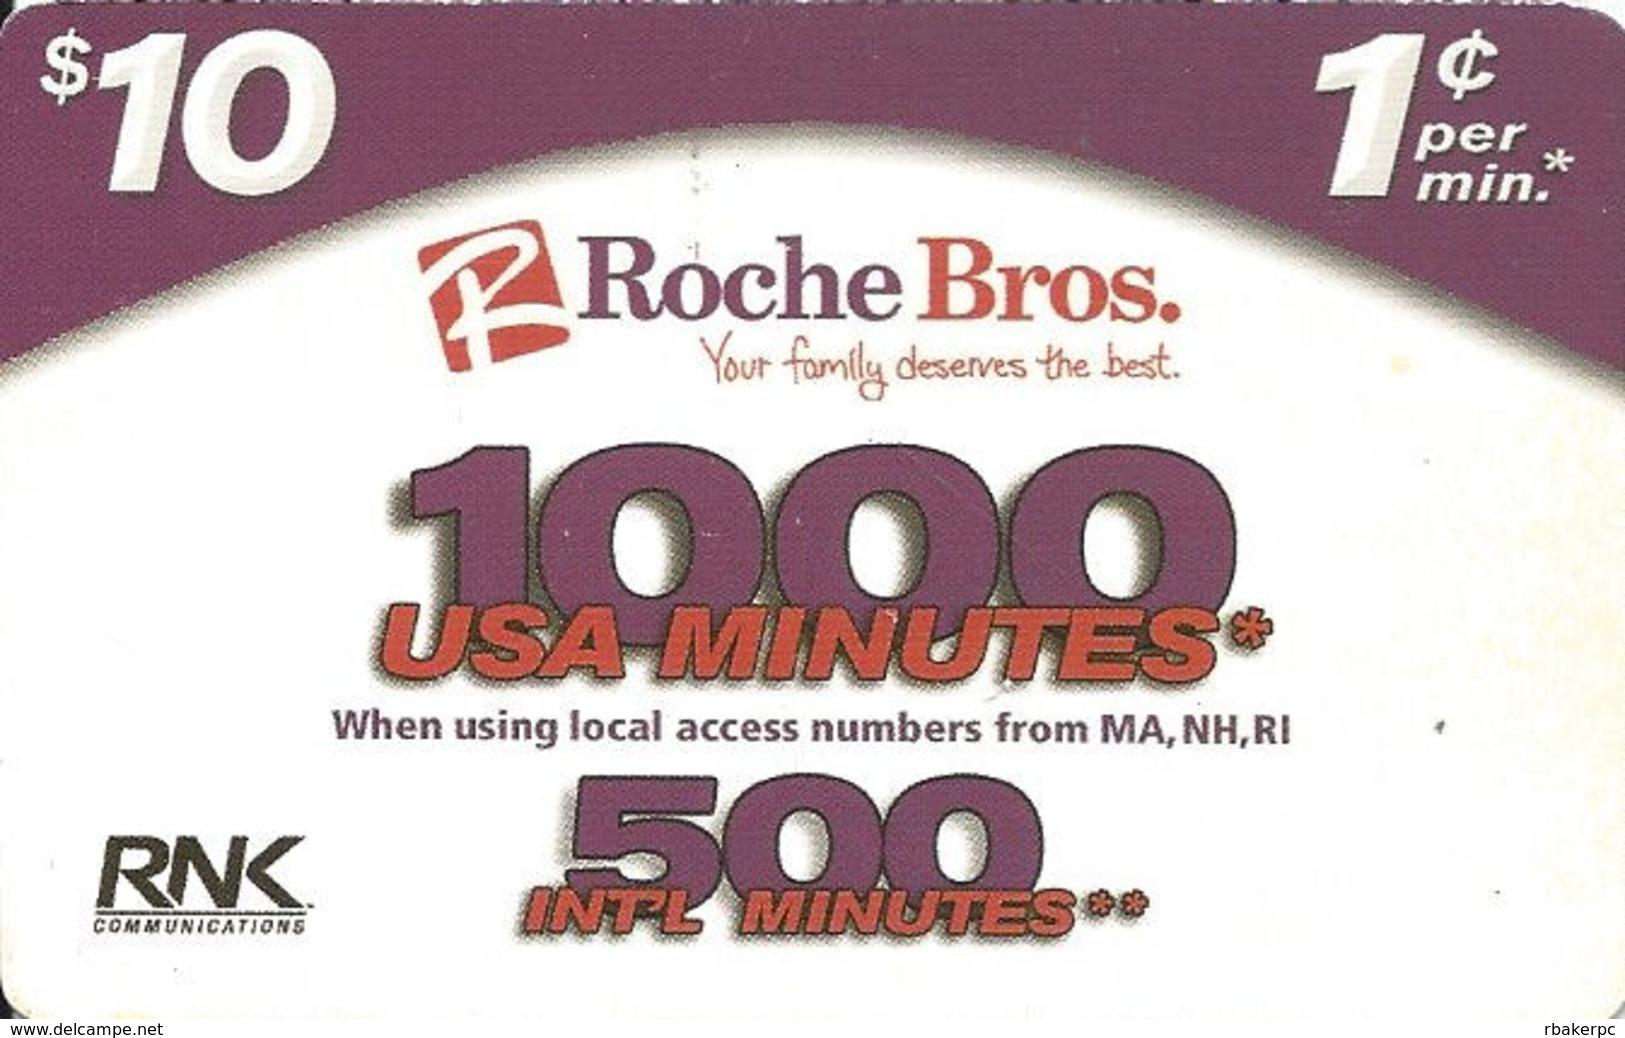 Roche Bros. Paper Prepaid Calling Card - United States